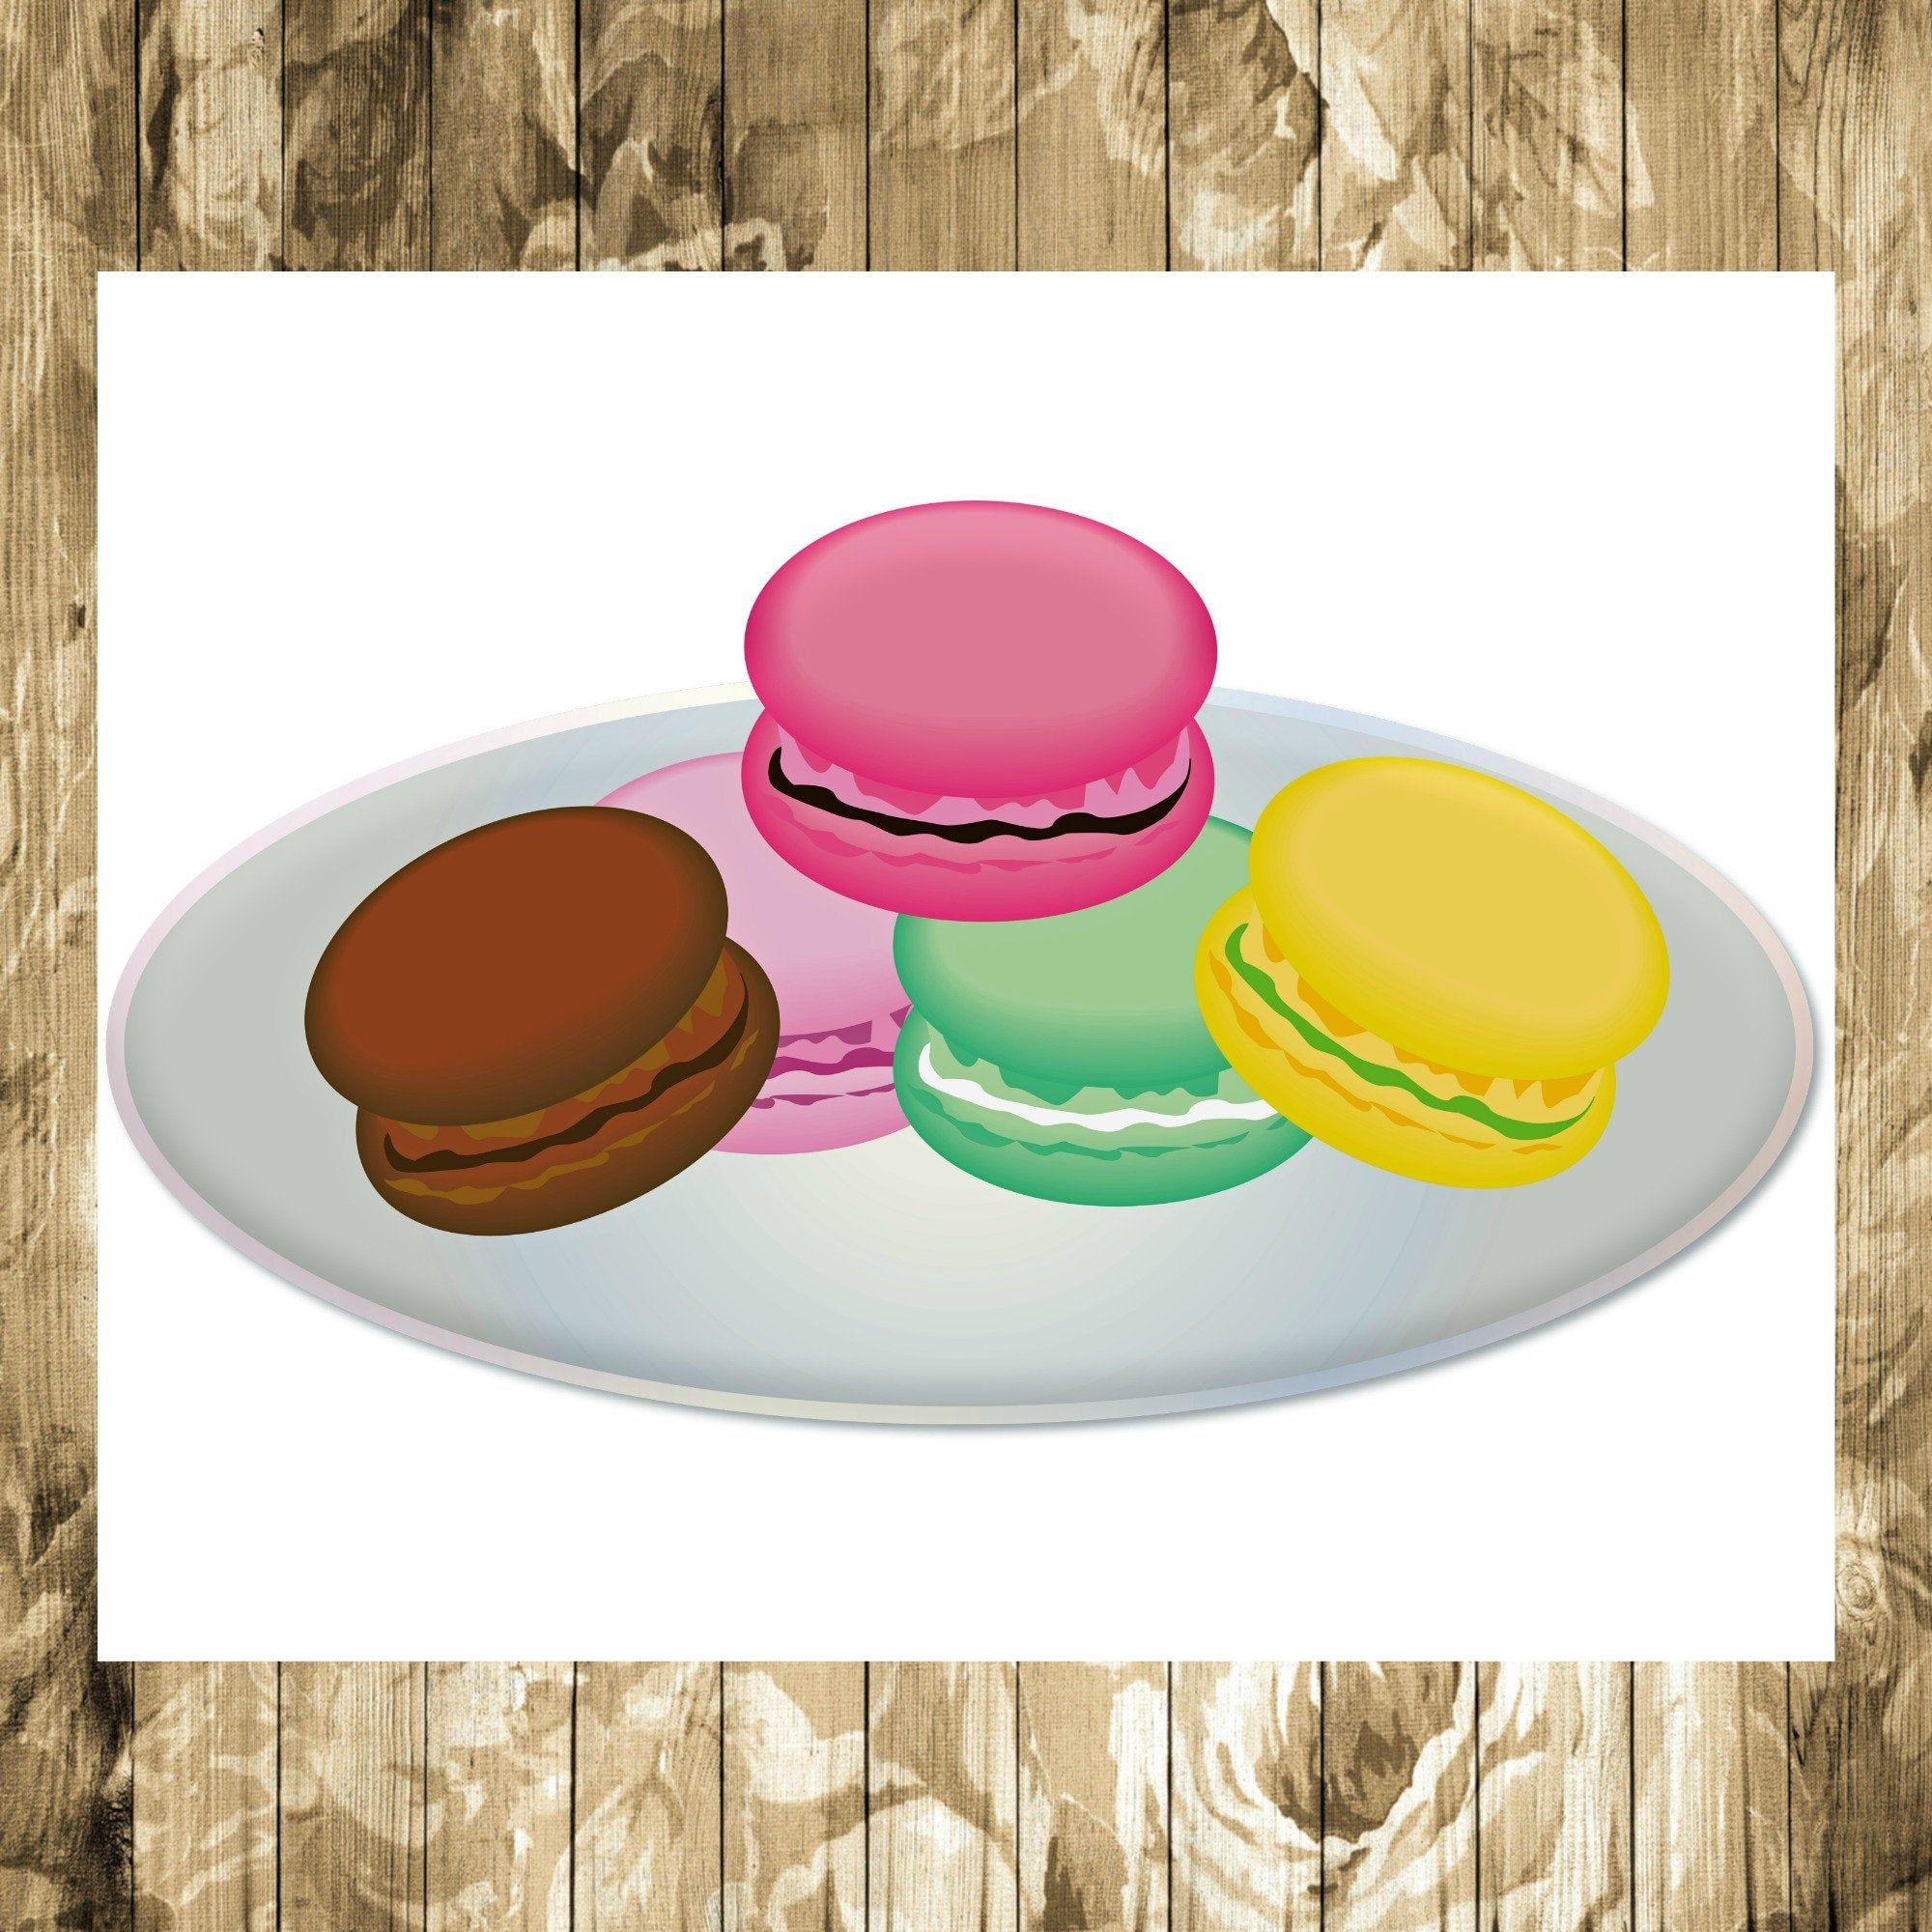 Macron Christmas Cookies Recipes 2020 Kawaii Cookies Kawaii Food Kawaii Macrons Cookies Food | Etsy in